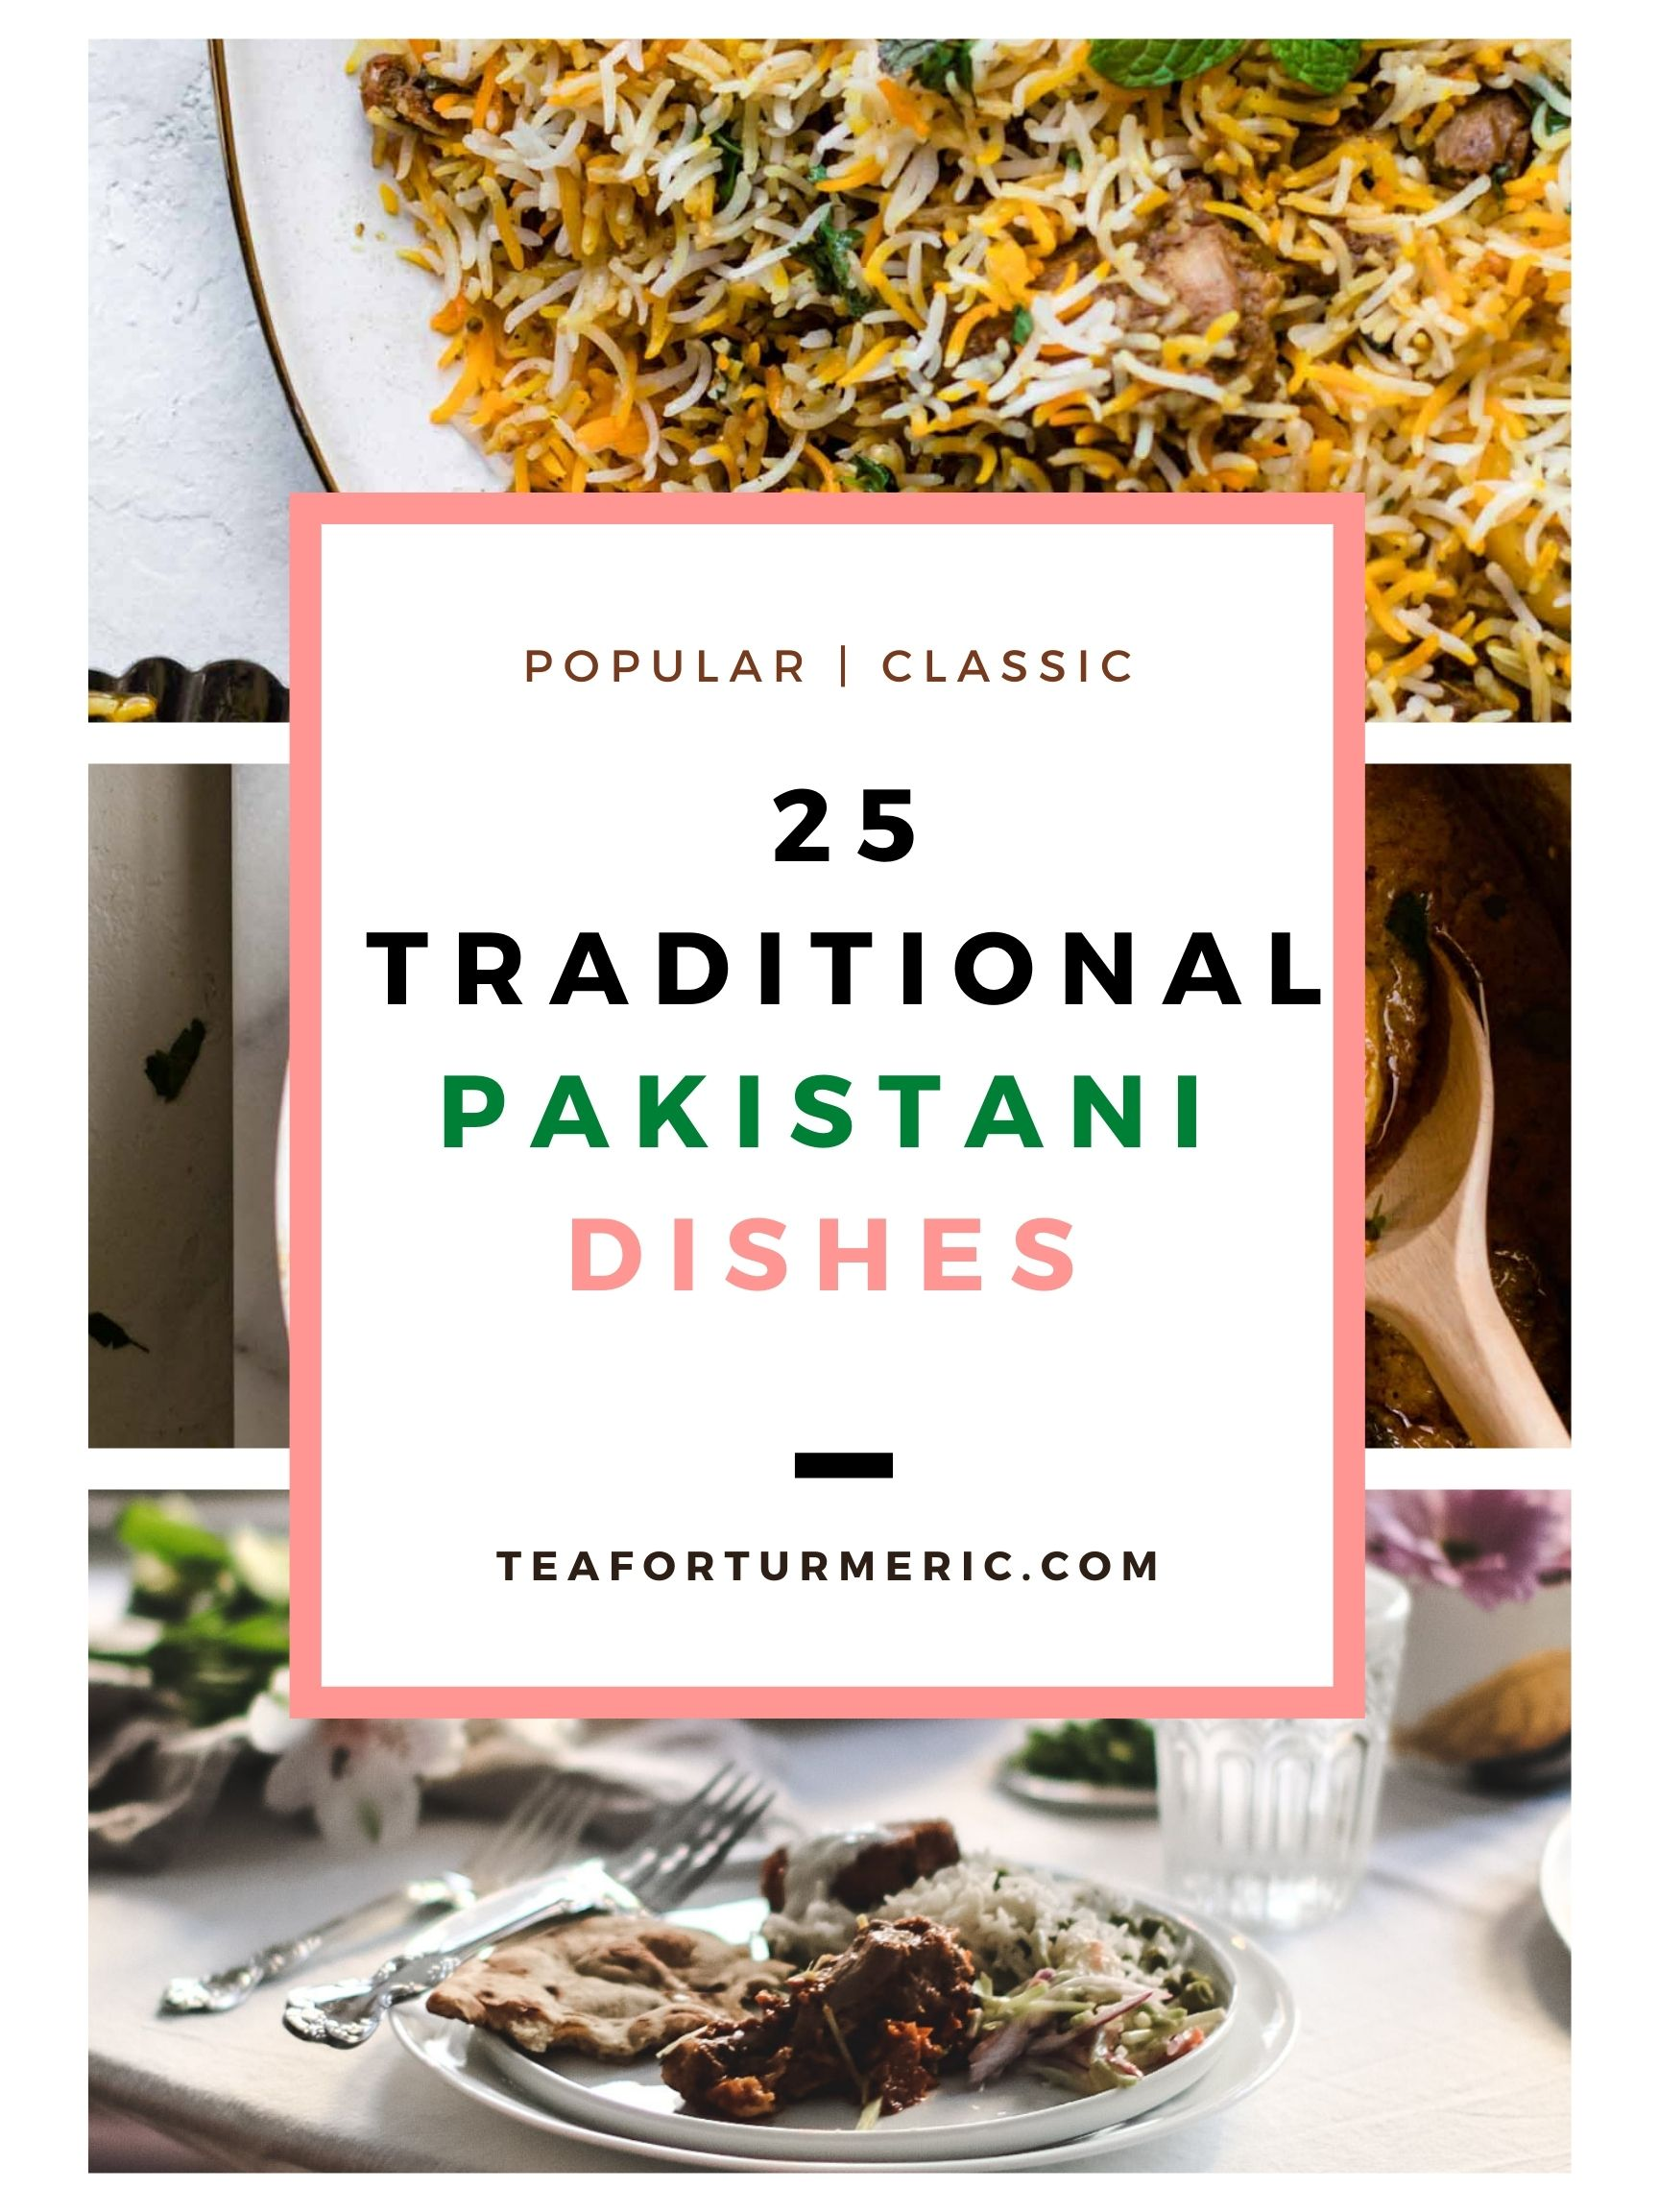 Traditional Pakistani Dishes Roundup